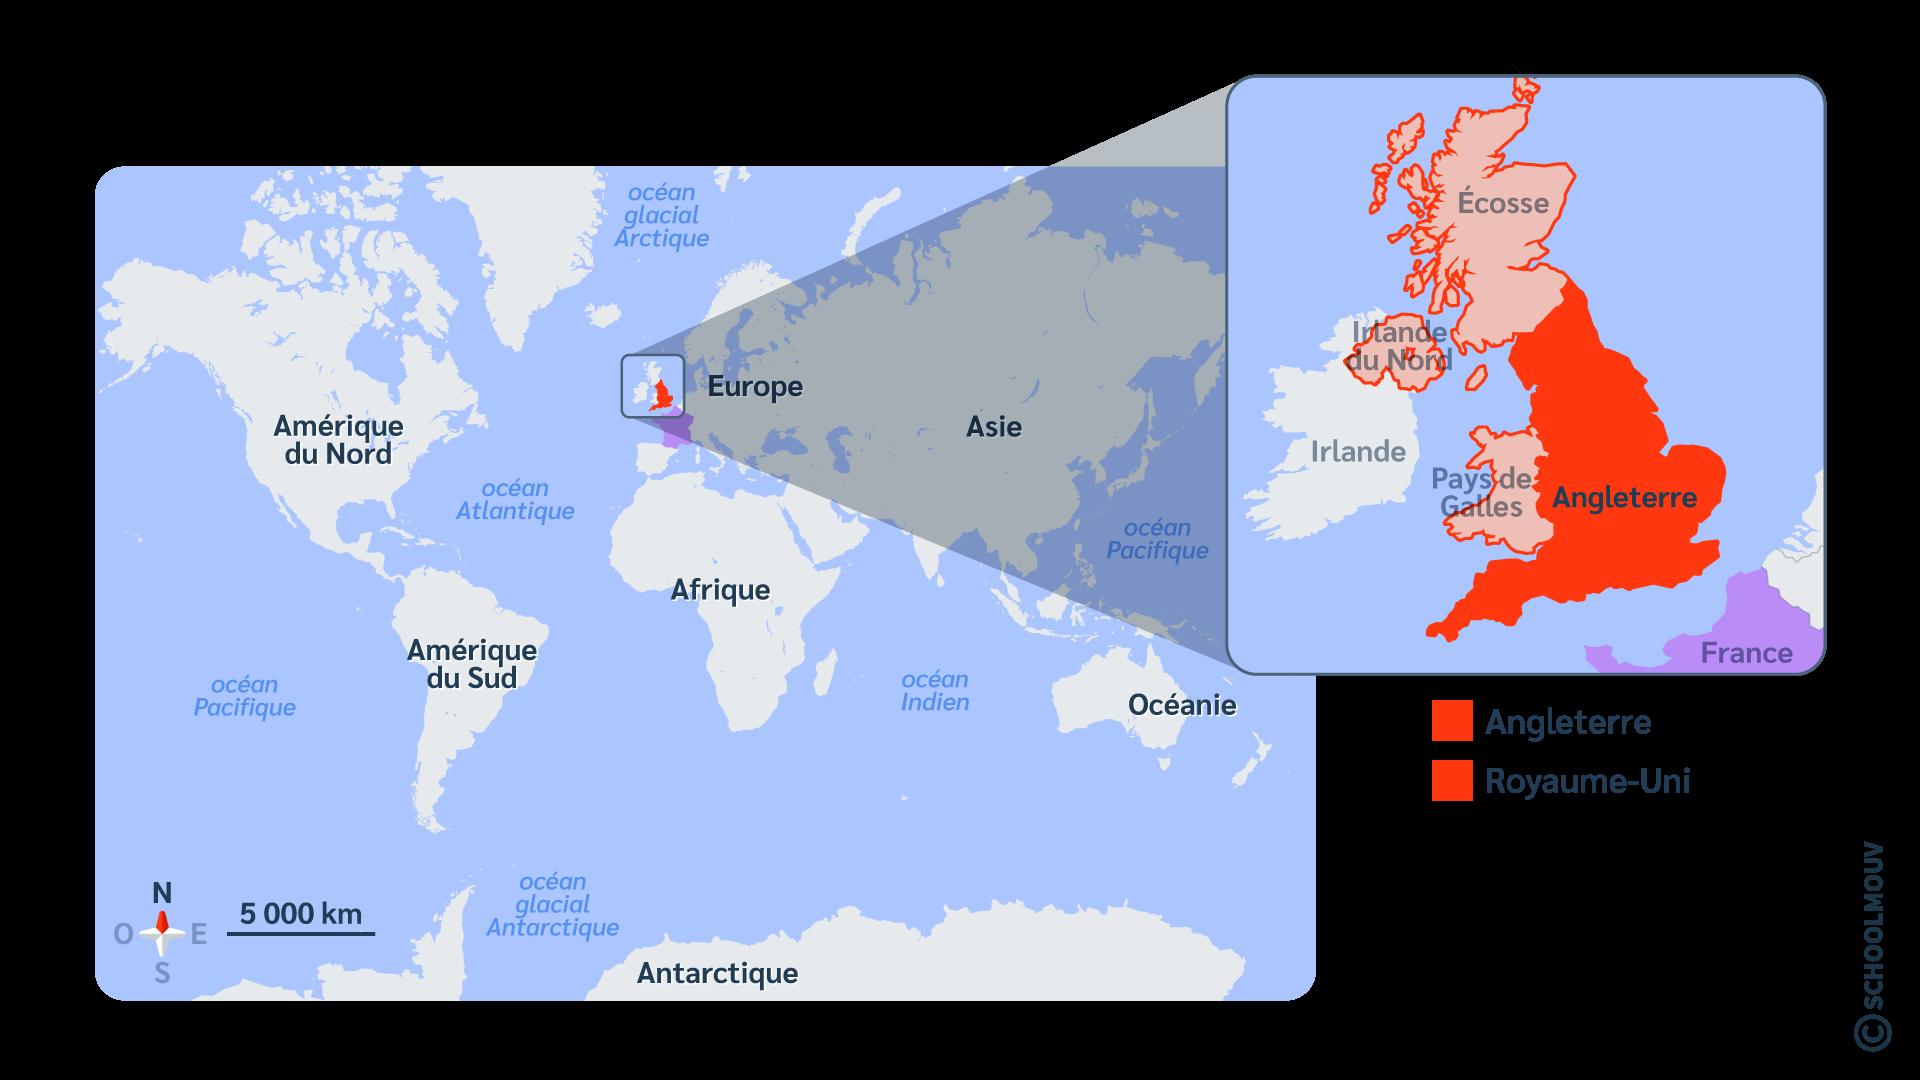 Angleterre carte Royaume-Uni monde anglais